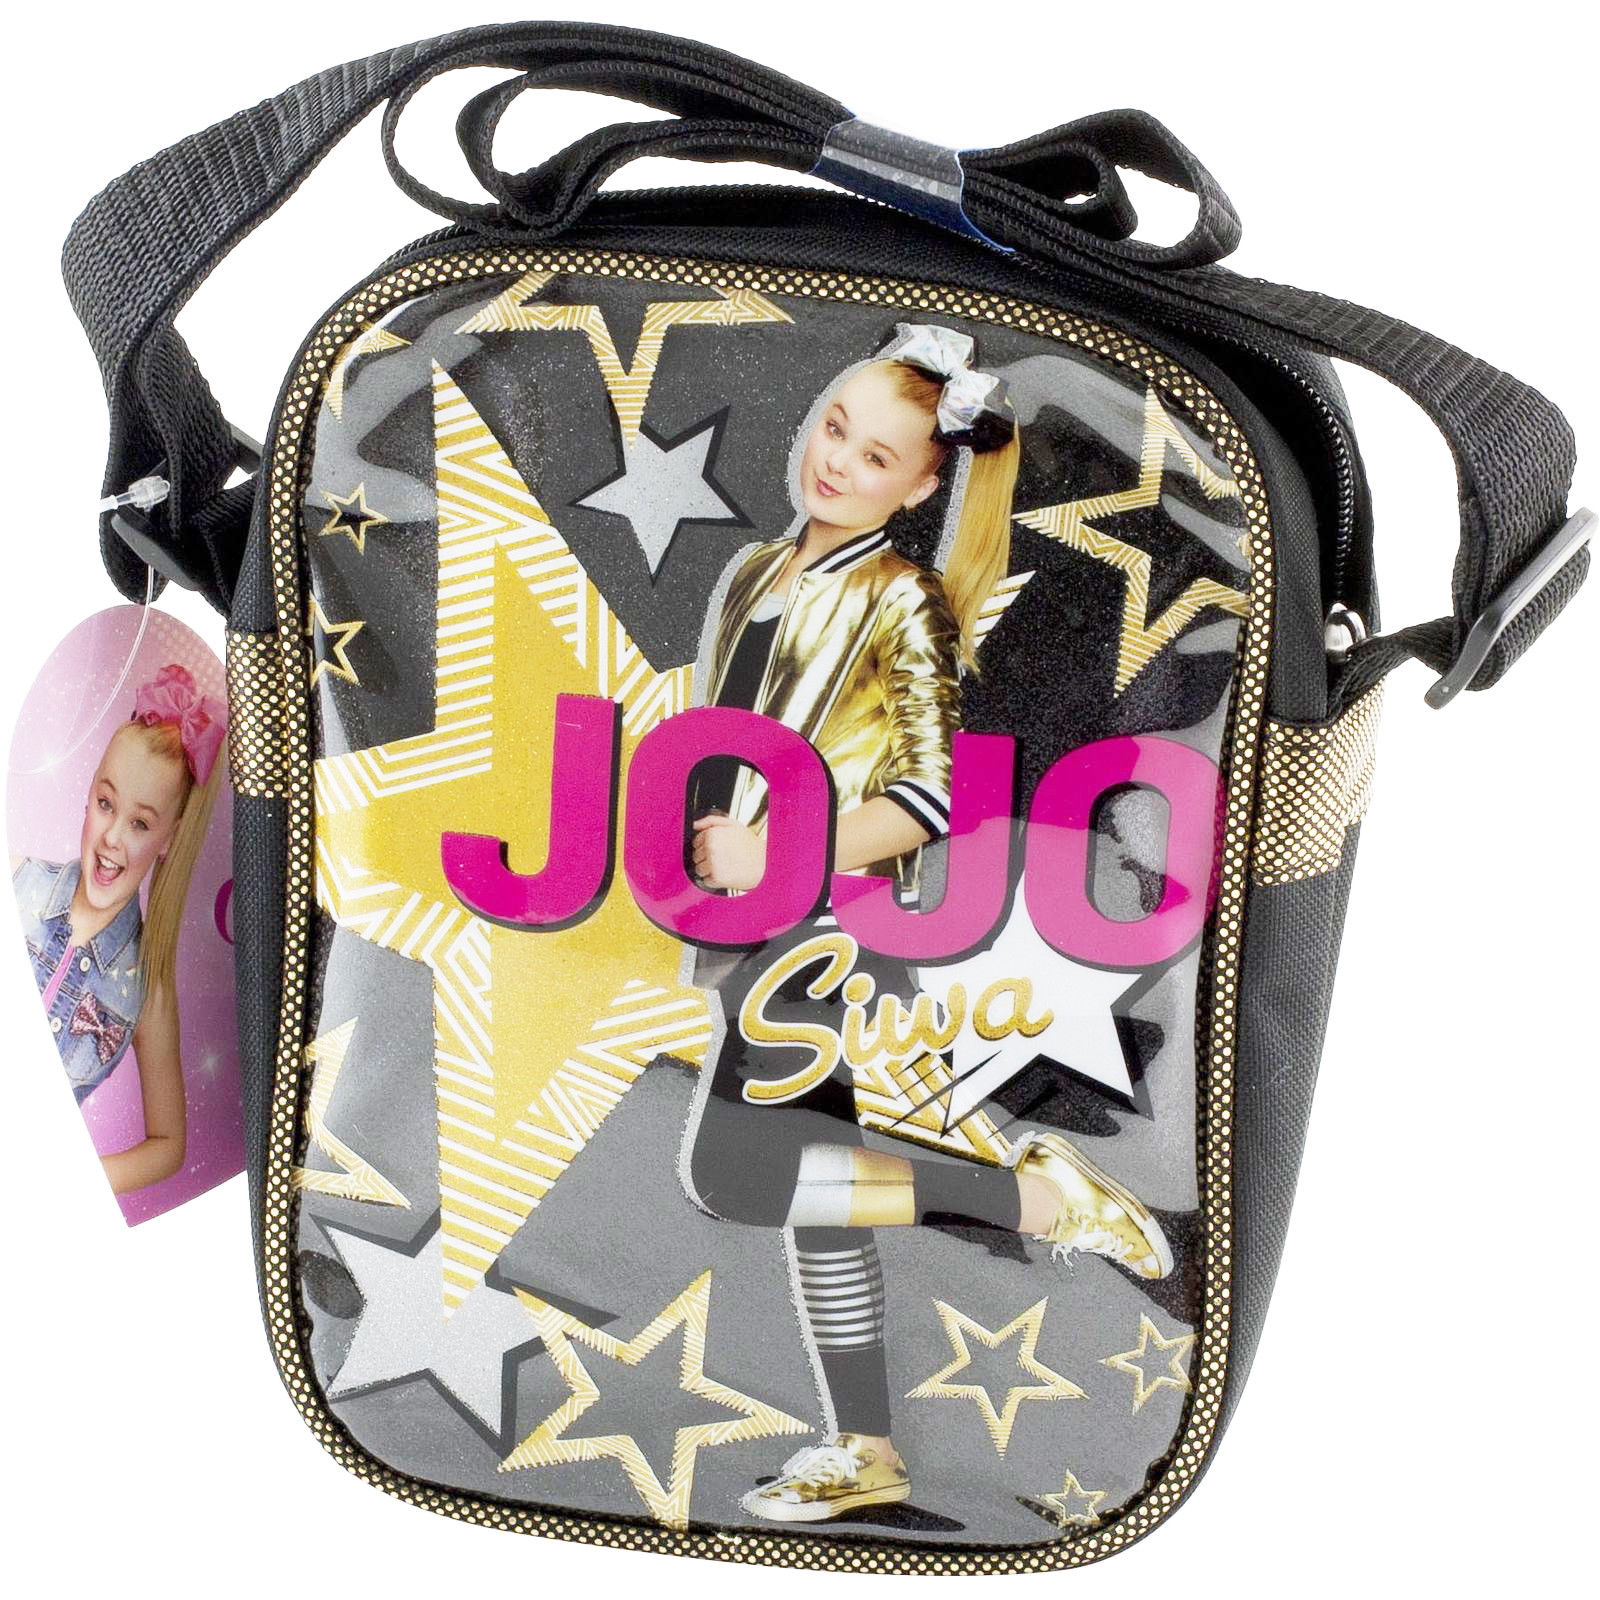 Nickelodeon JoJo Siwa Girls Crossbody Bag Purse Adjustable